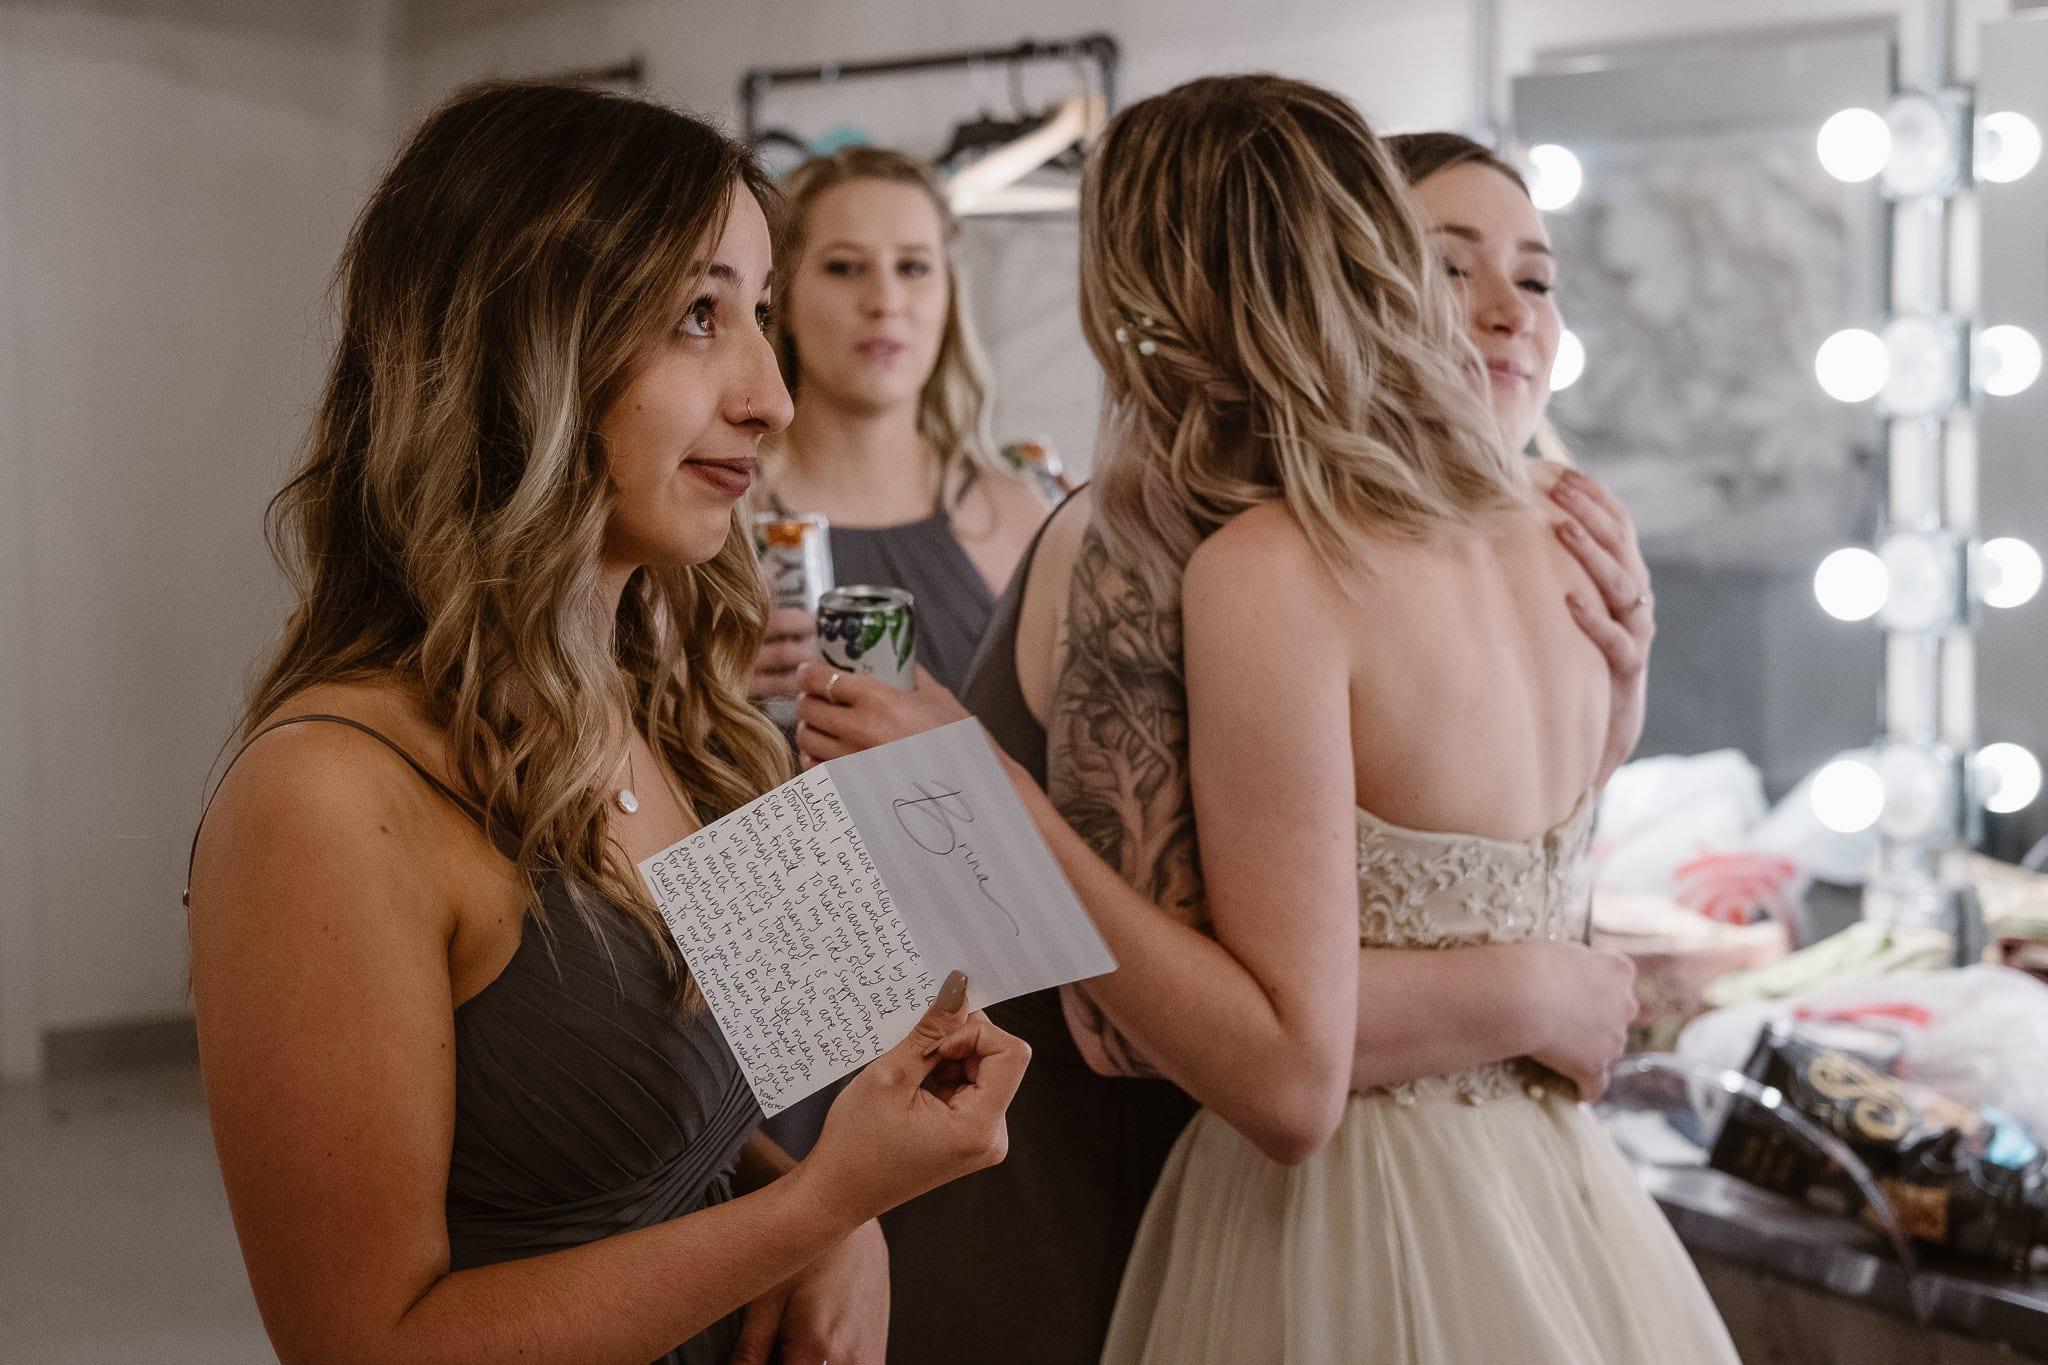 St Vrain Wedding Photographer | Longmont Wedding Photographer | Colorado Winter Wedding Photographer, Colorado industrial chic wedding, bride and bridesmaids crying